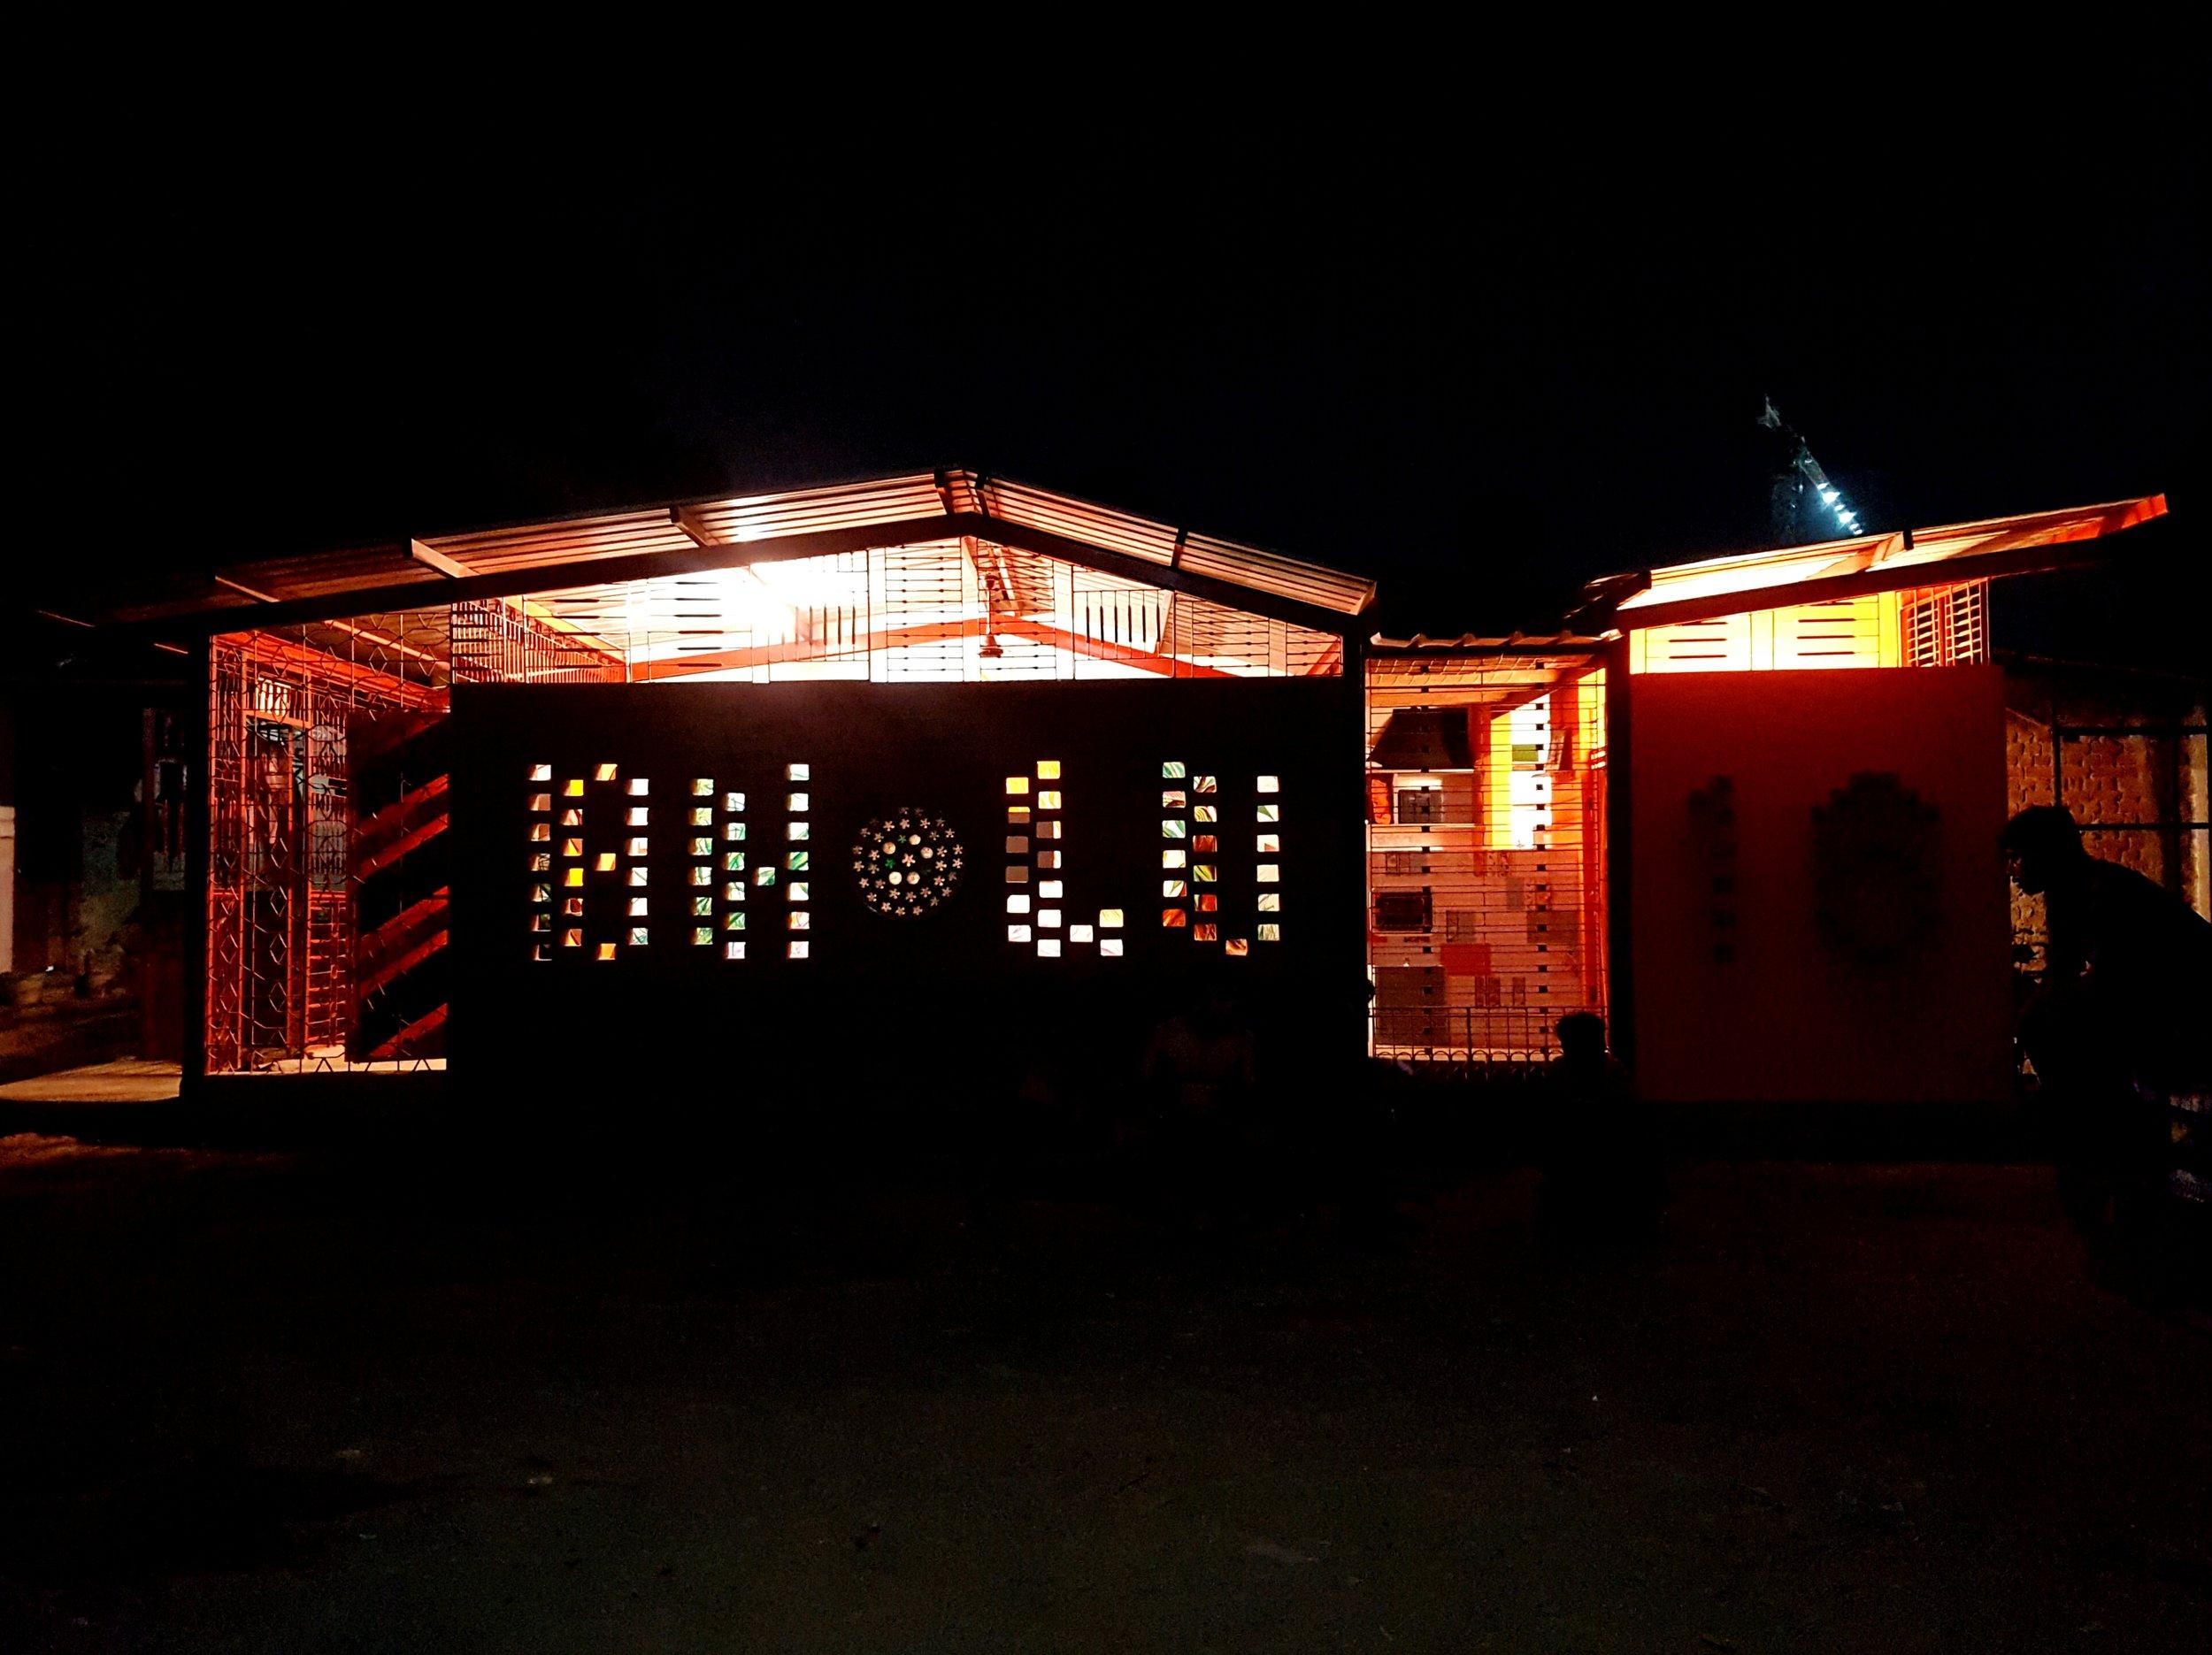 13_Bholu 16 night.jpg